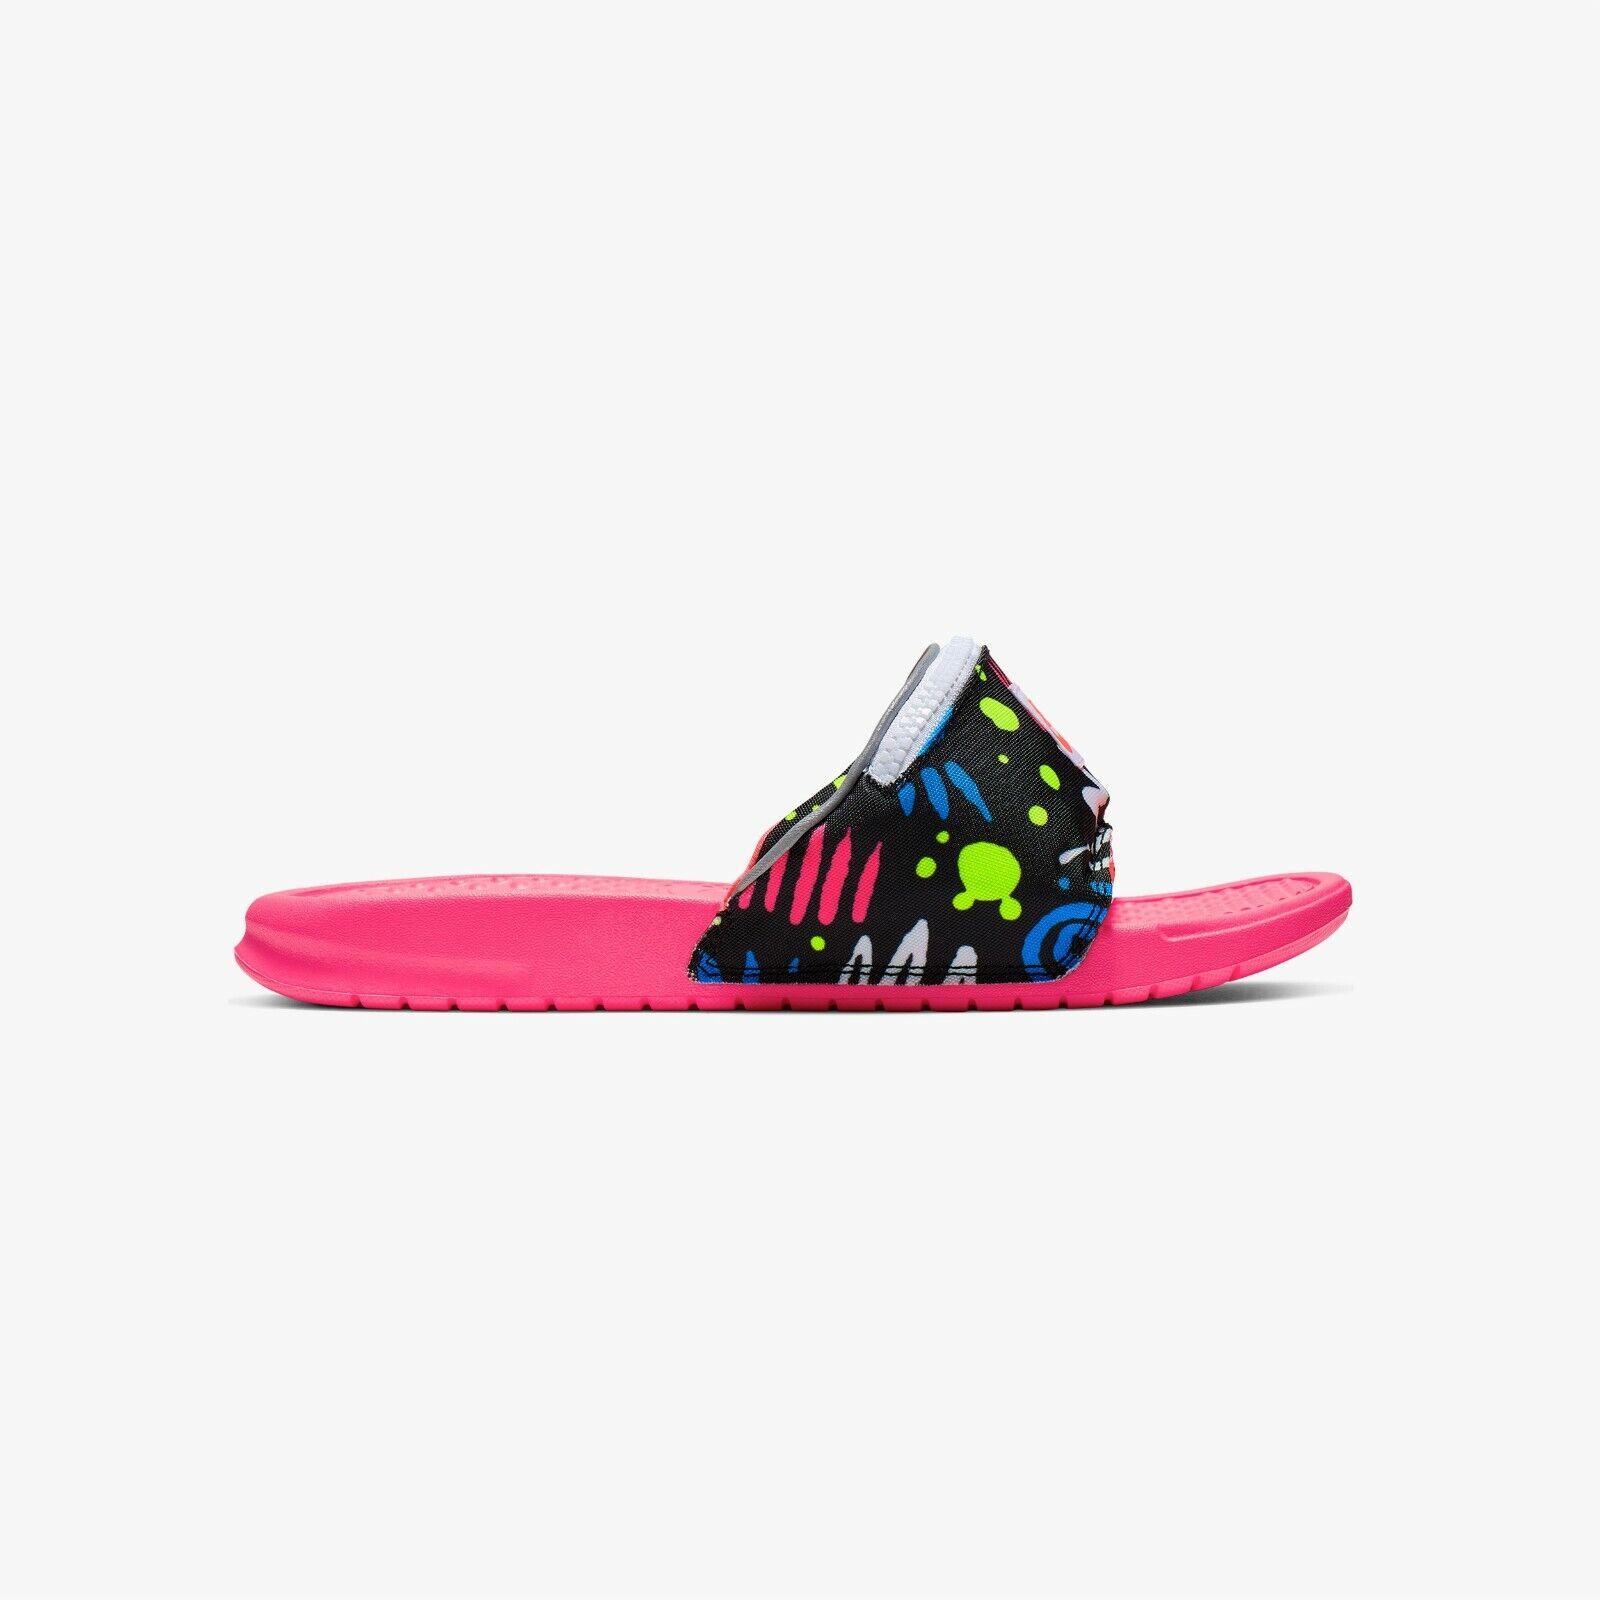 sofá Derribar Conceder  Nike Benassi JDI Fanny Pack Mens Ao1037-600 HYPER Punch Grape Sandals Size  12 for sale online | eBay